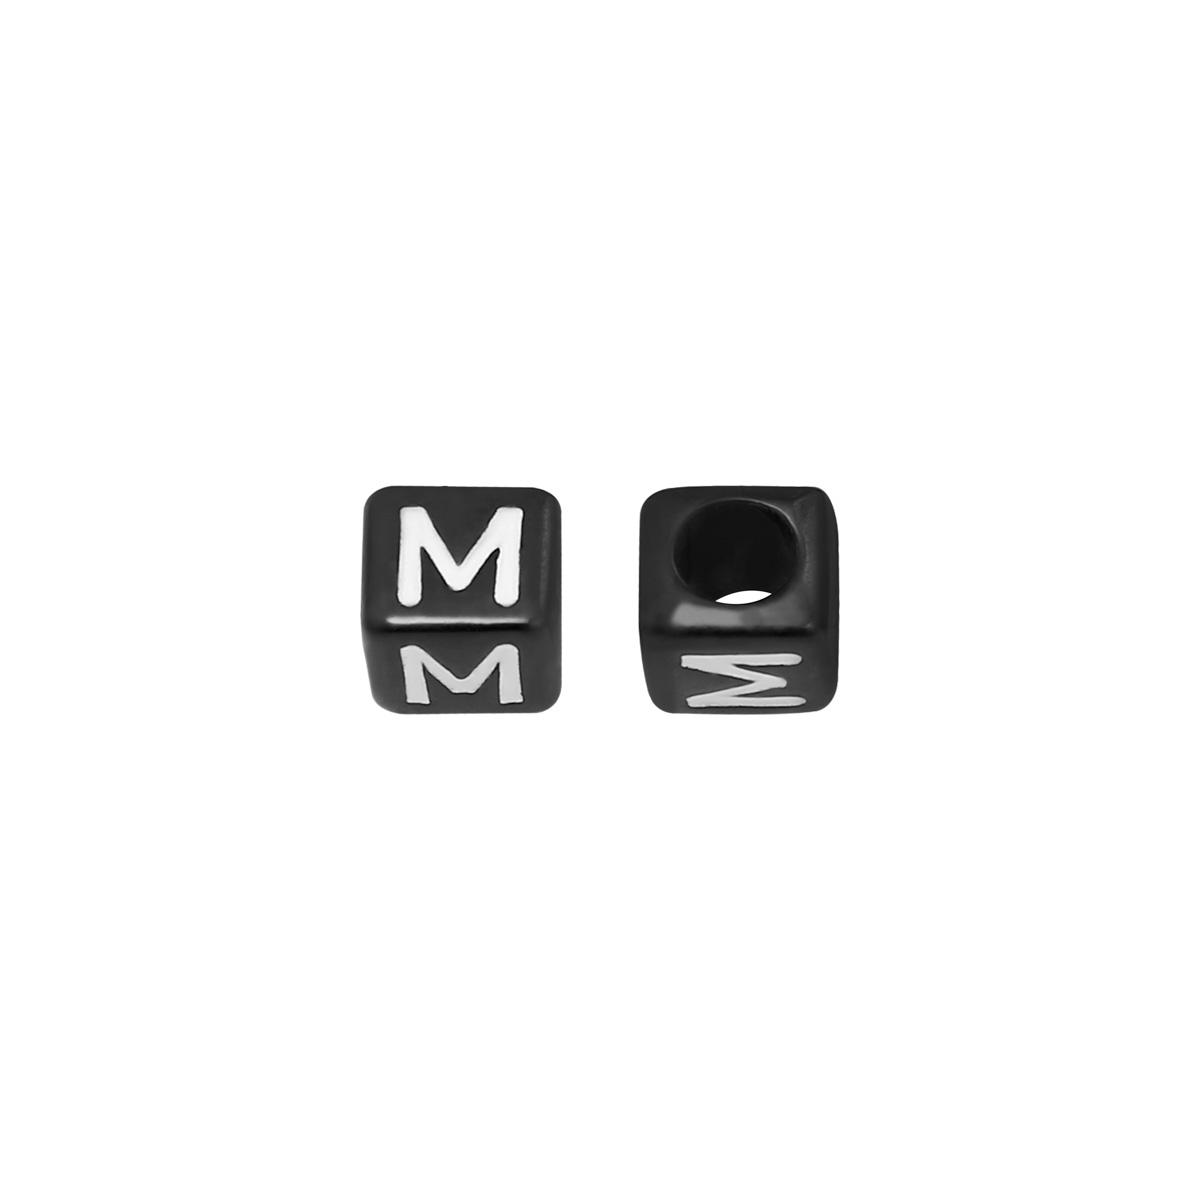 Perlen diy letter m - 6mm